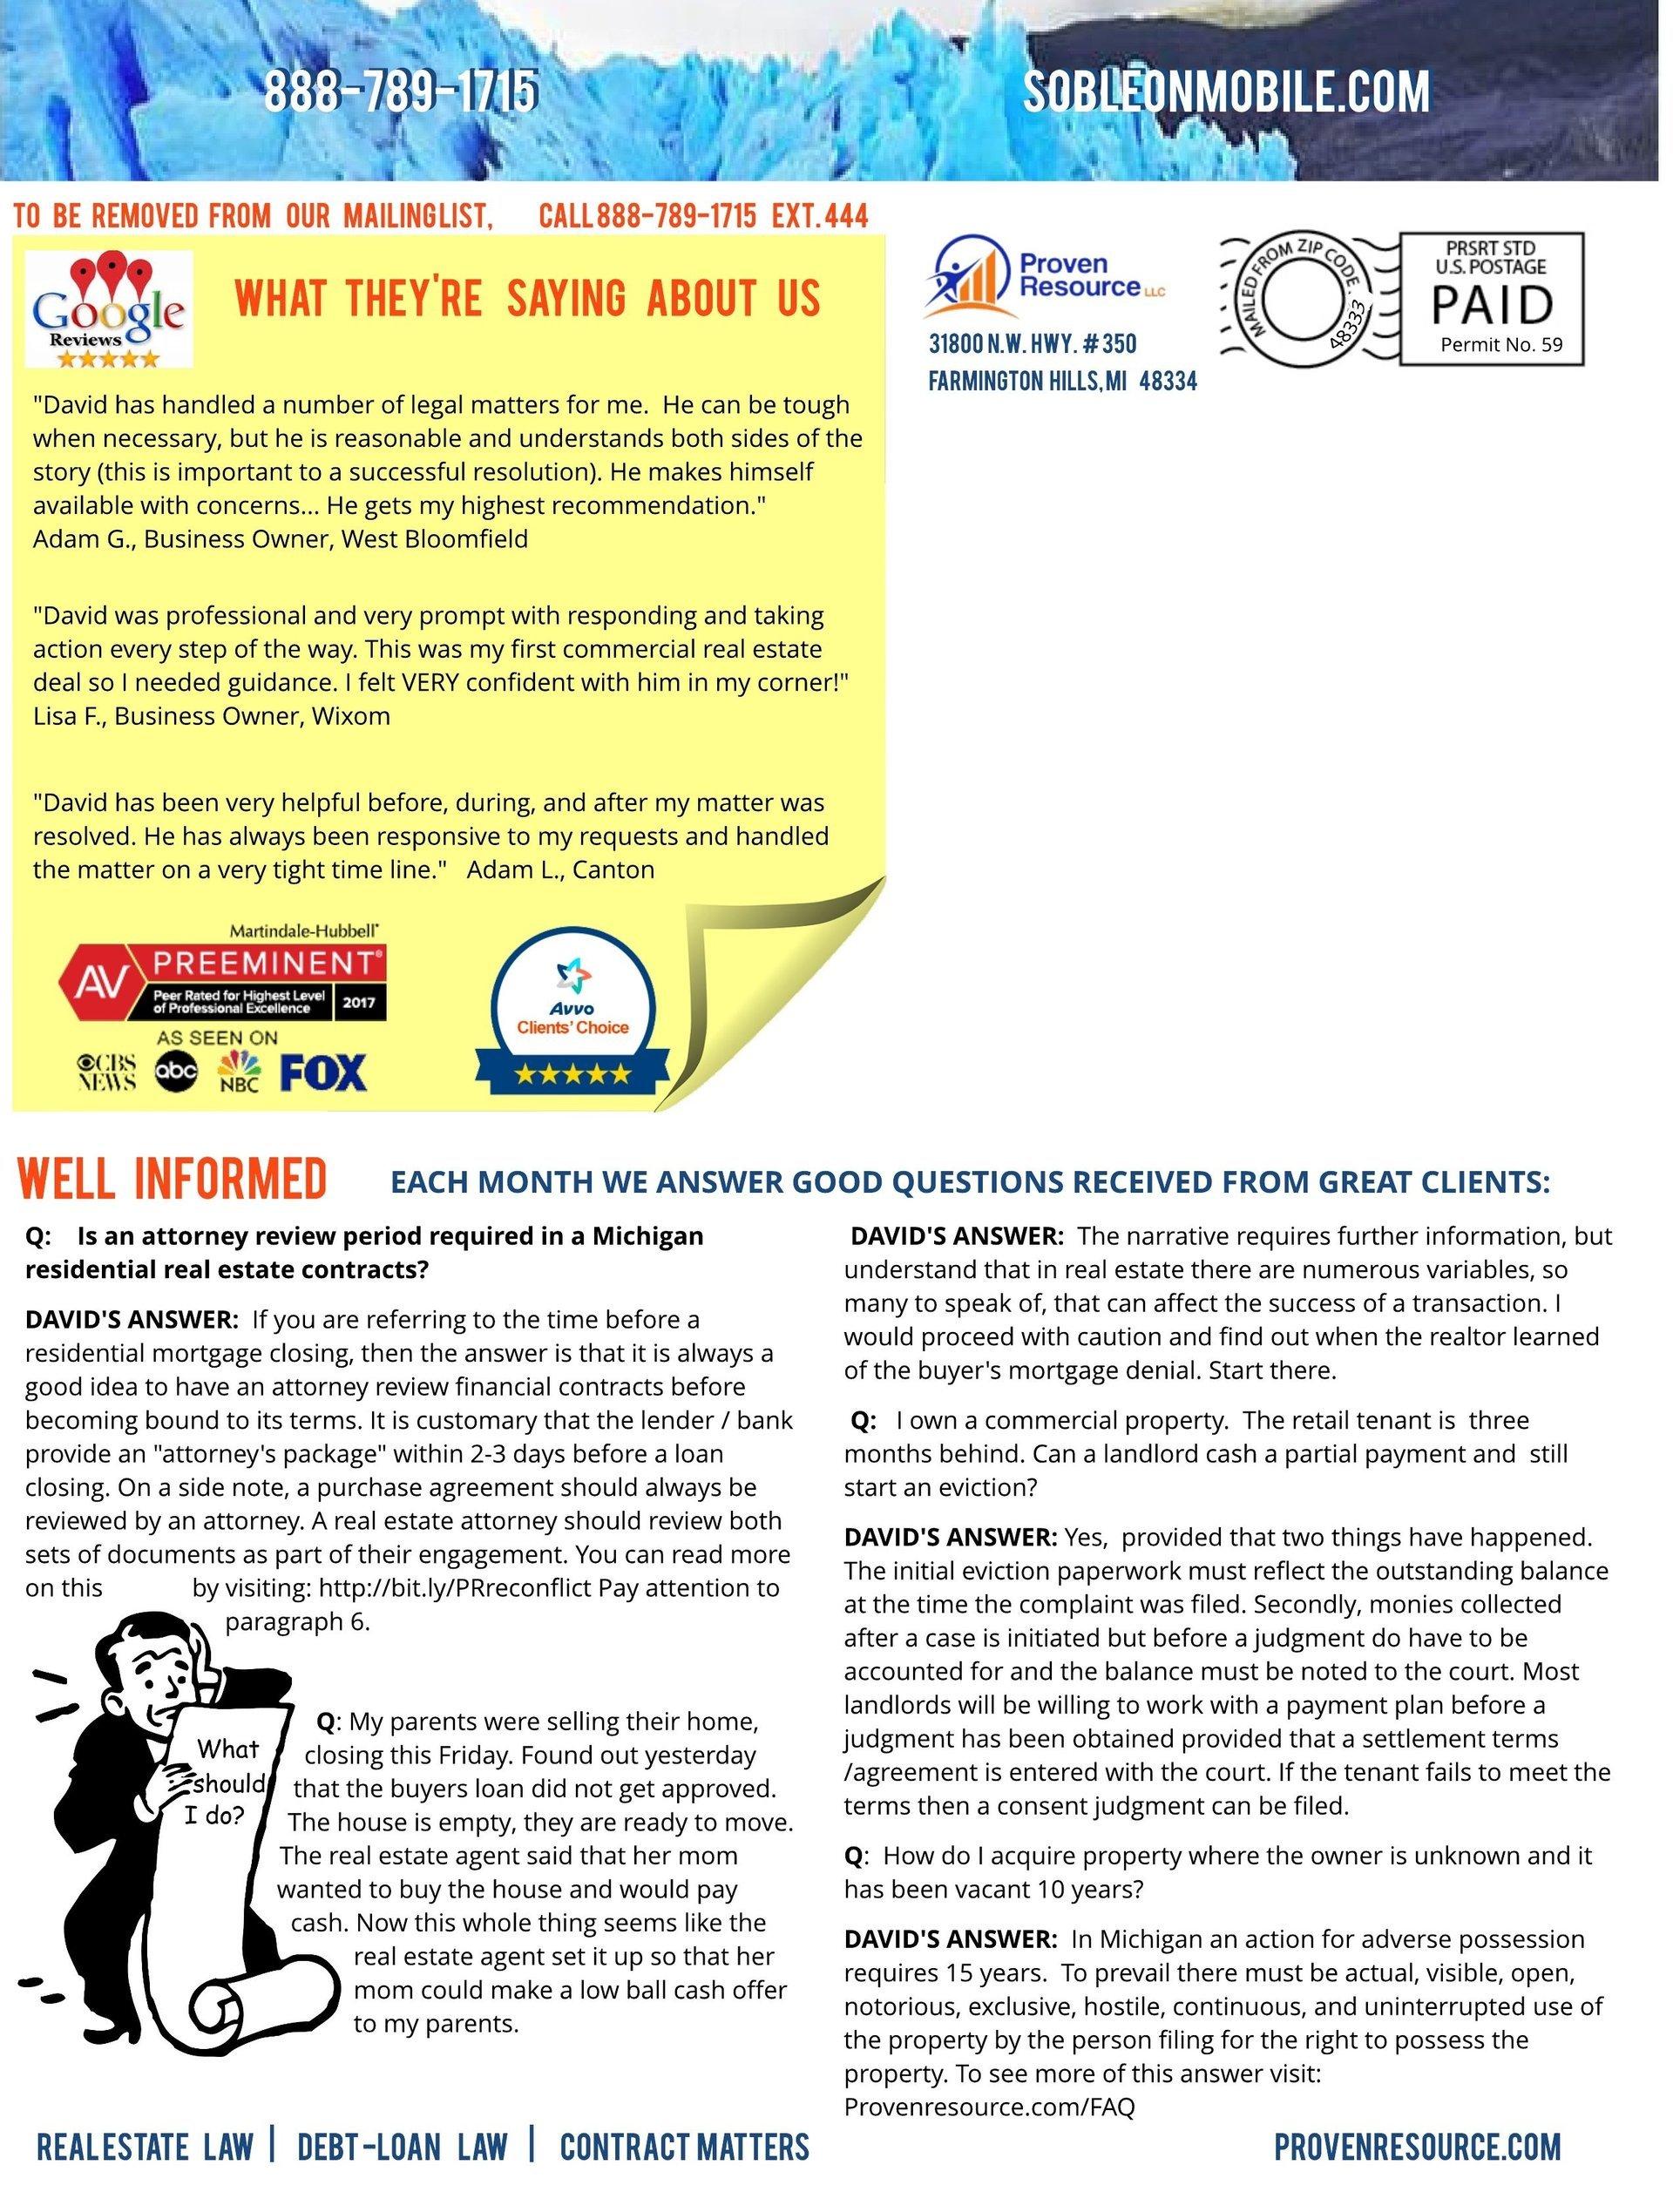 Proven Resource Newsletter Octoberish 4